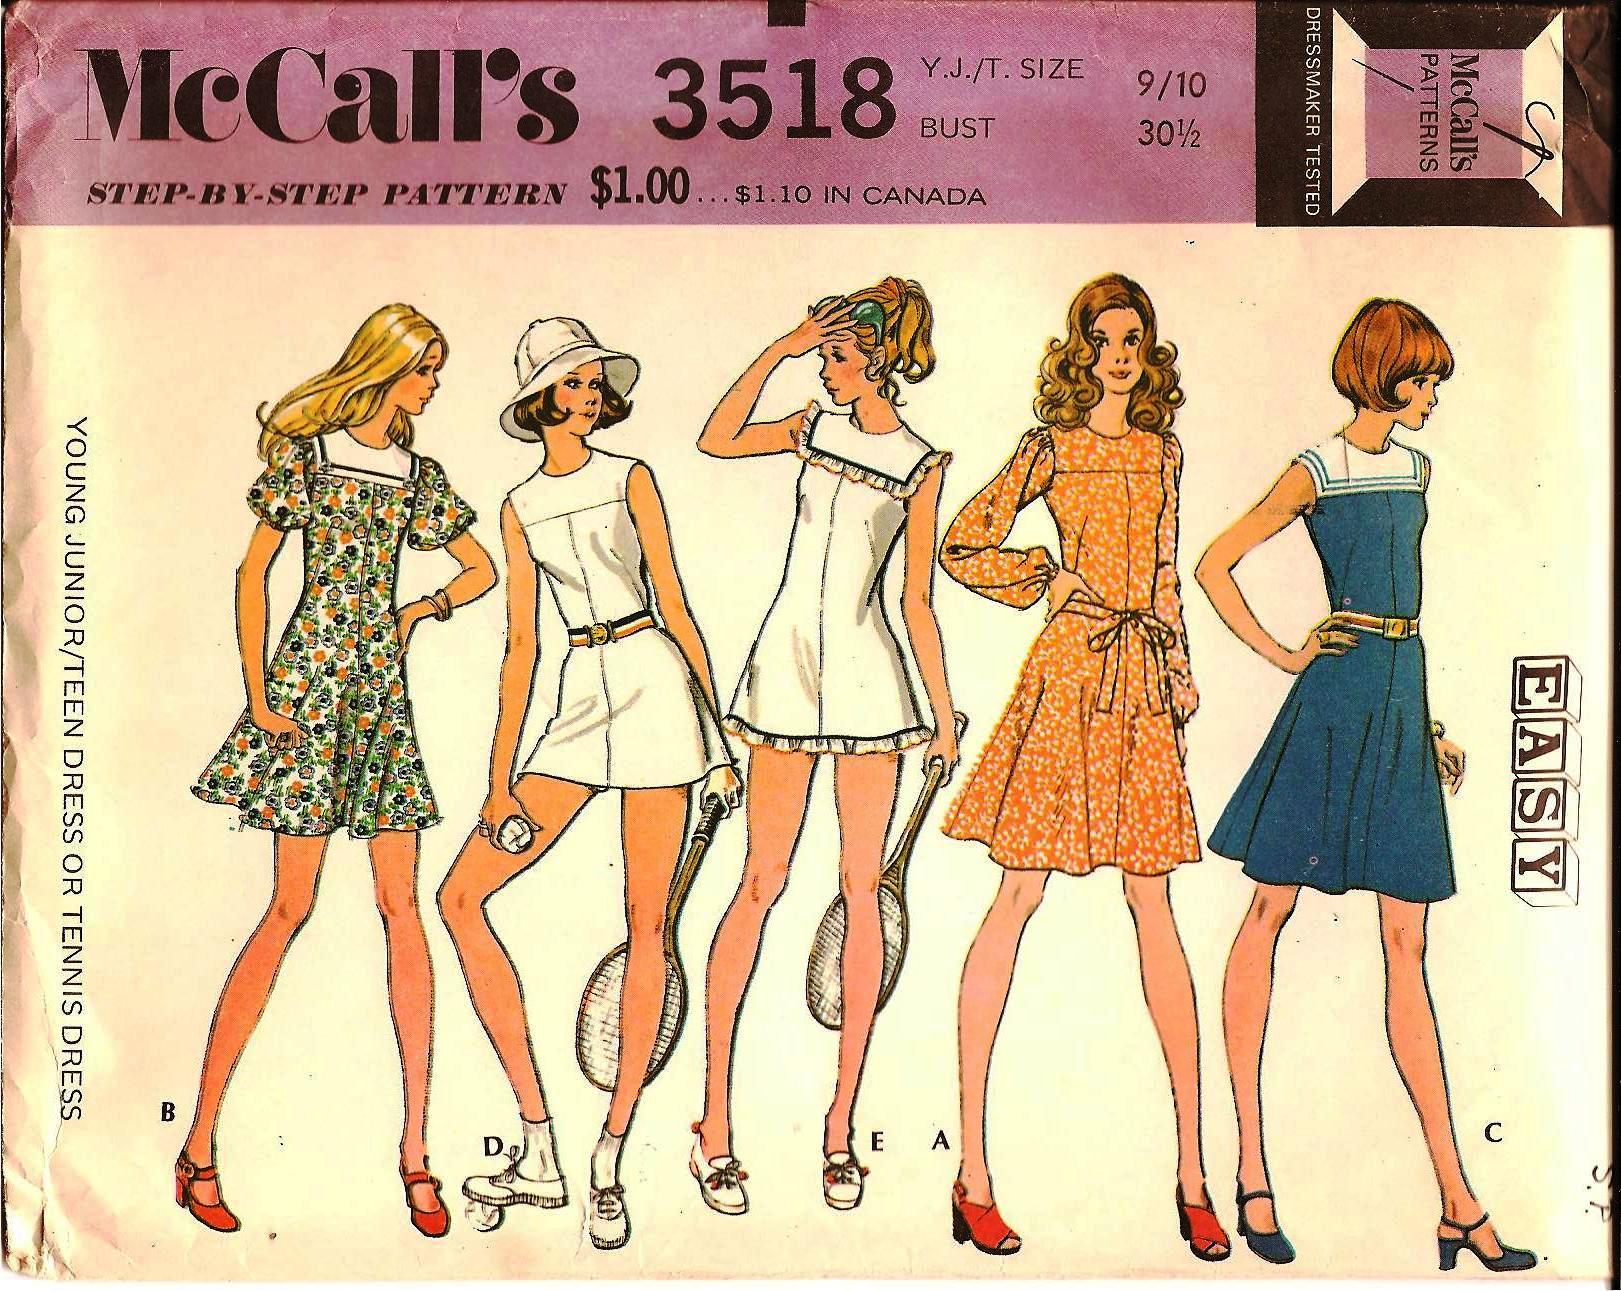 McCall's 3518